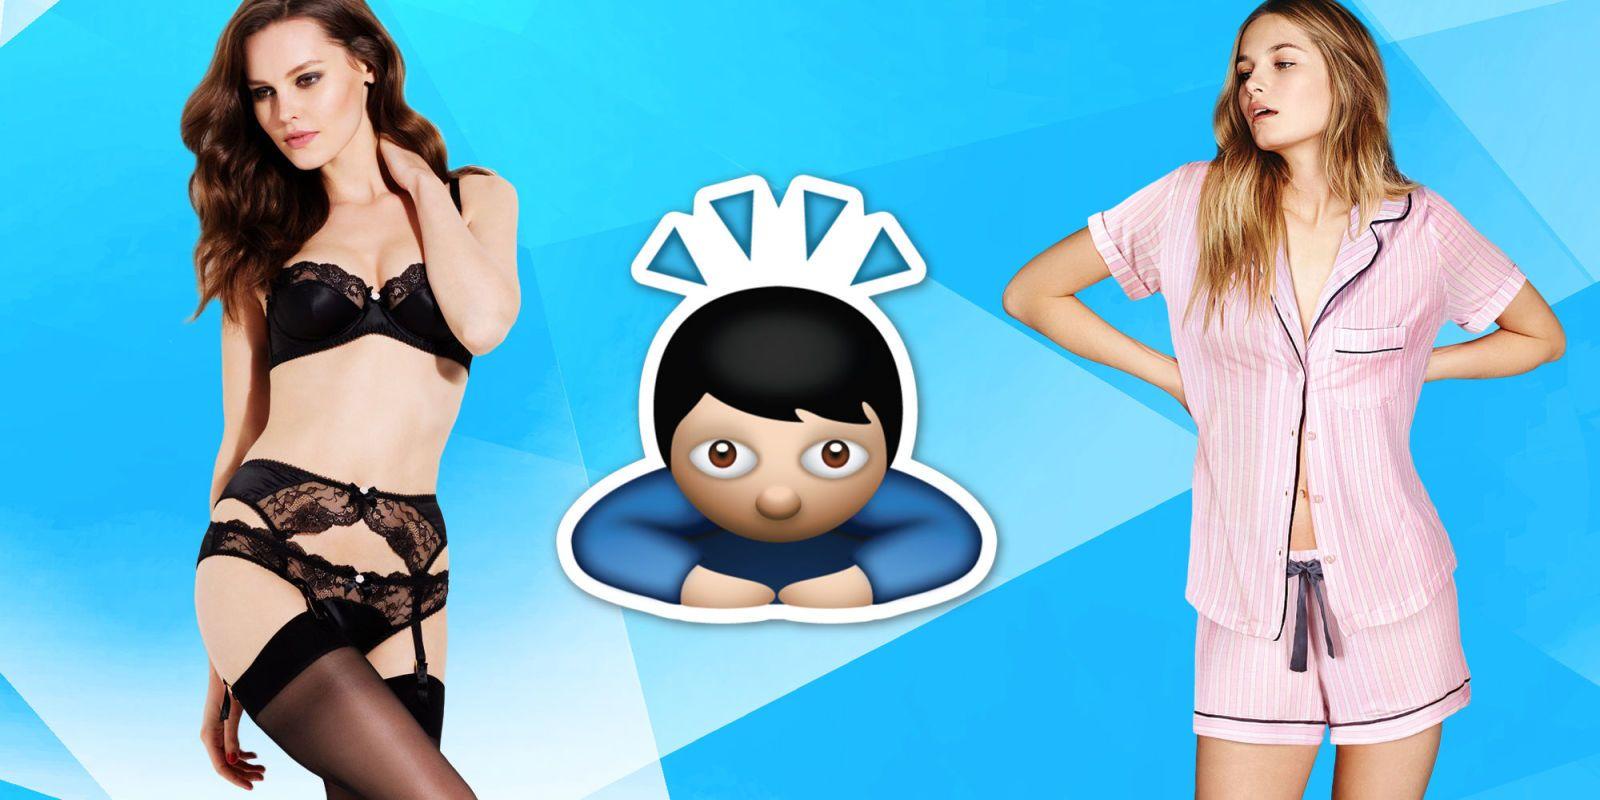 Should women wear panties to bed?